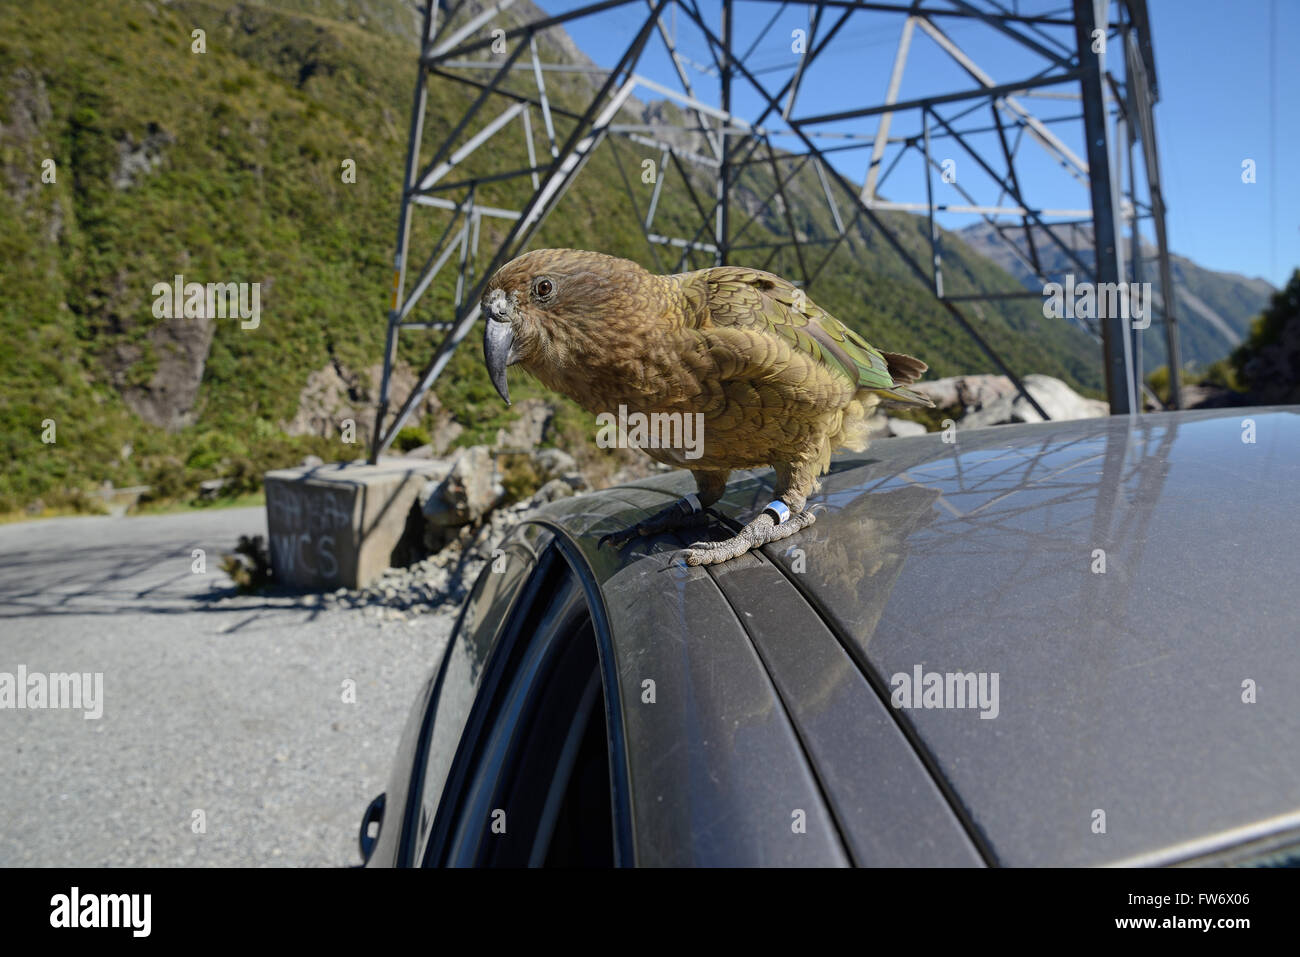 New Zealand alpine parrot, the Kea, Nestor notabilis,sitting on a car at Arthur's Pass National Park, to the delight Stock Photo